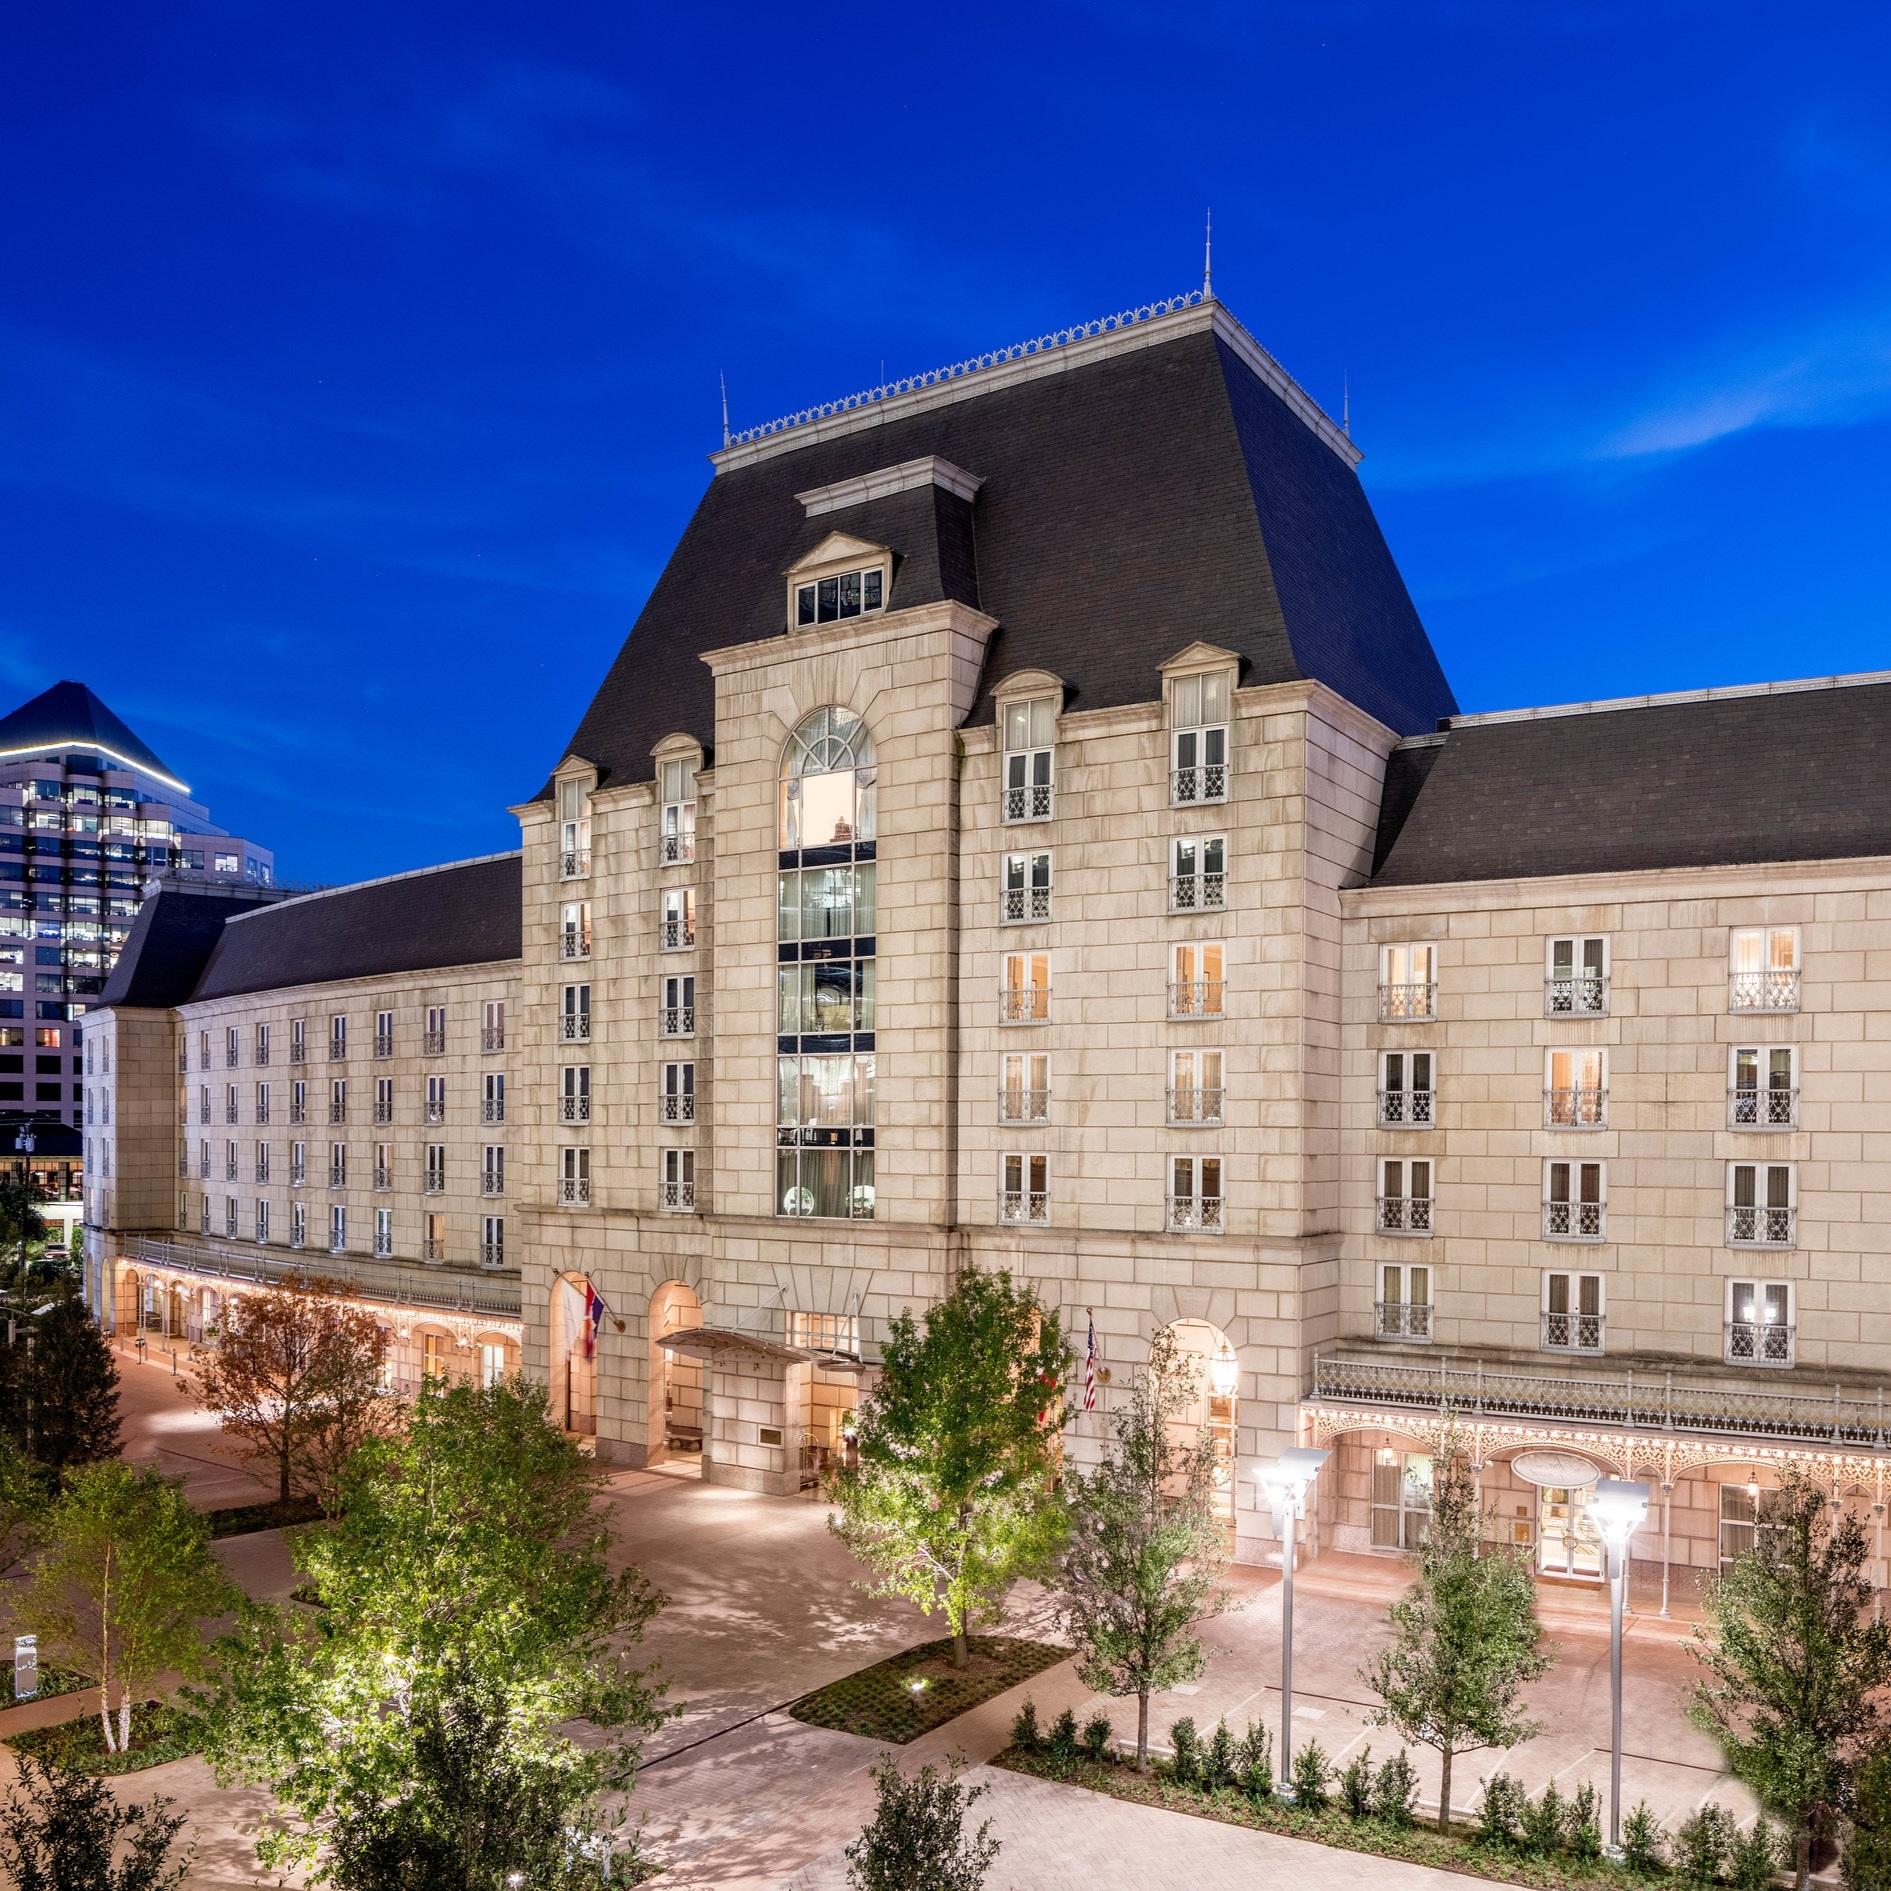 HOTEL CRESCENT COURT -